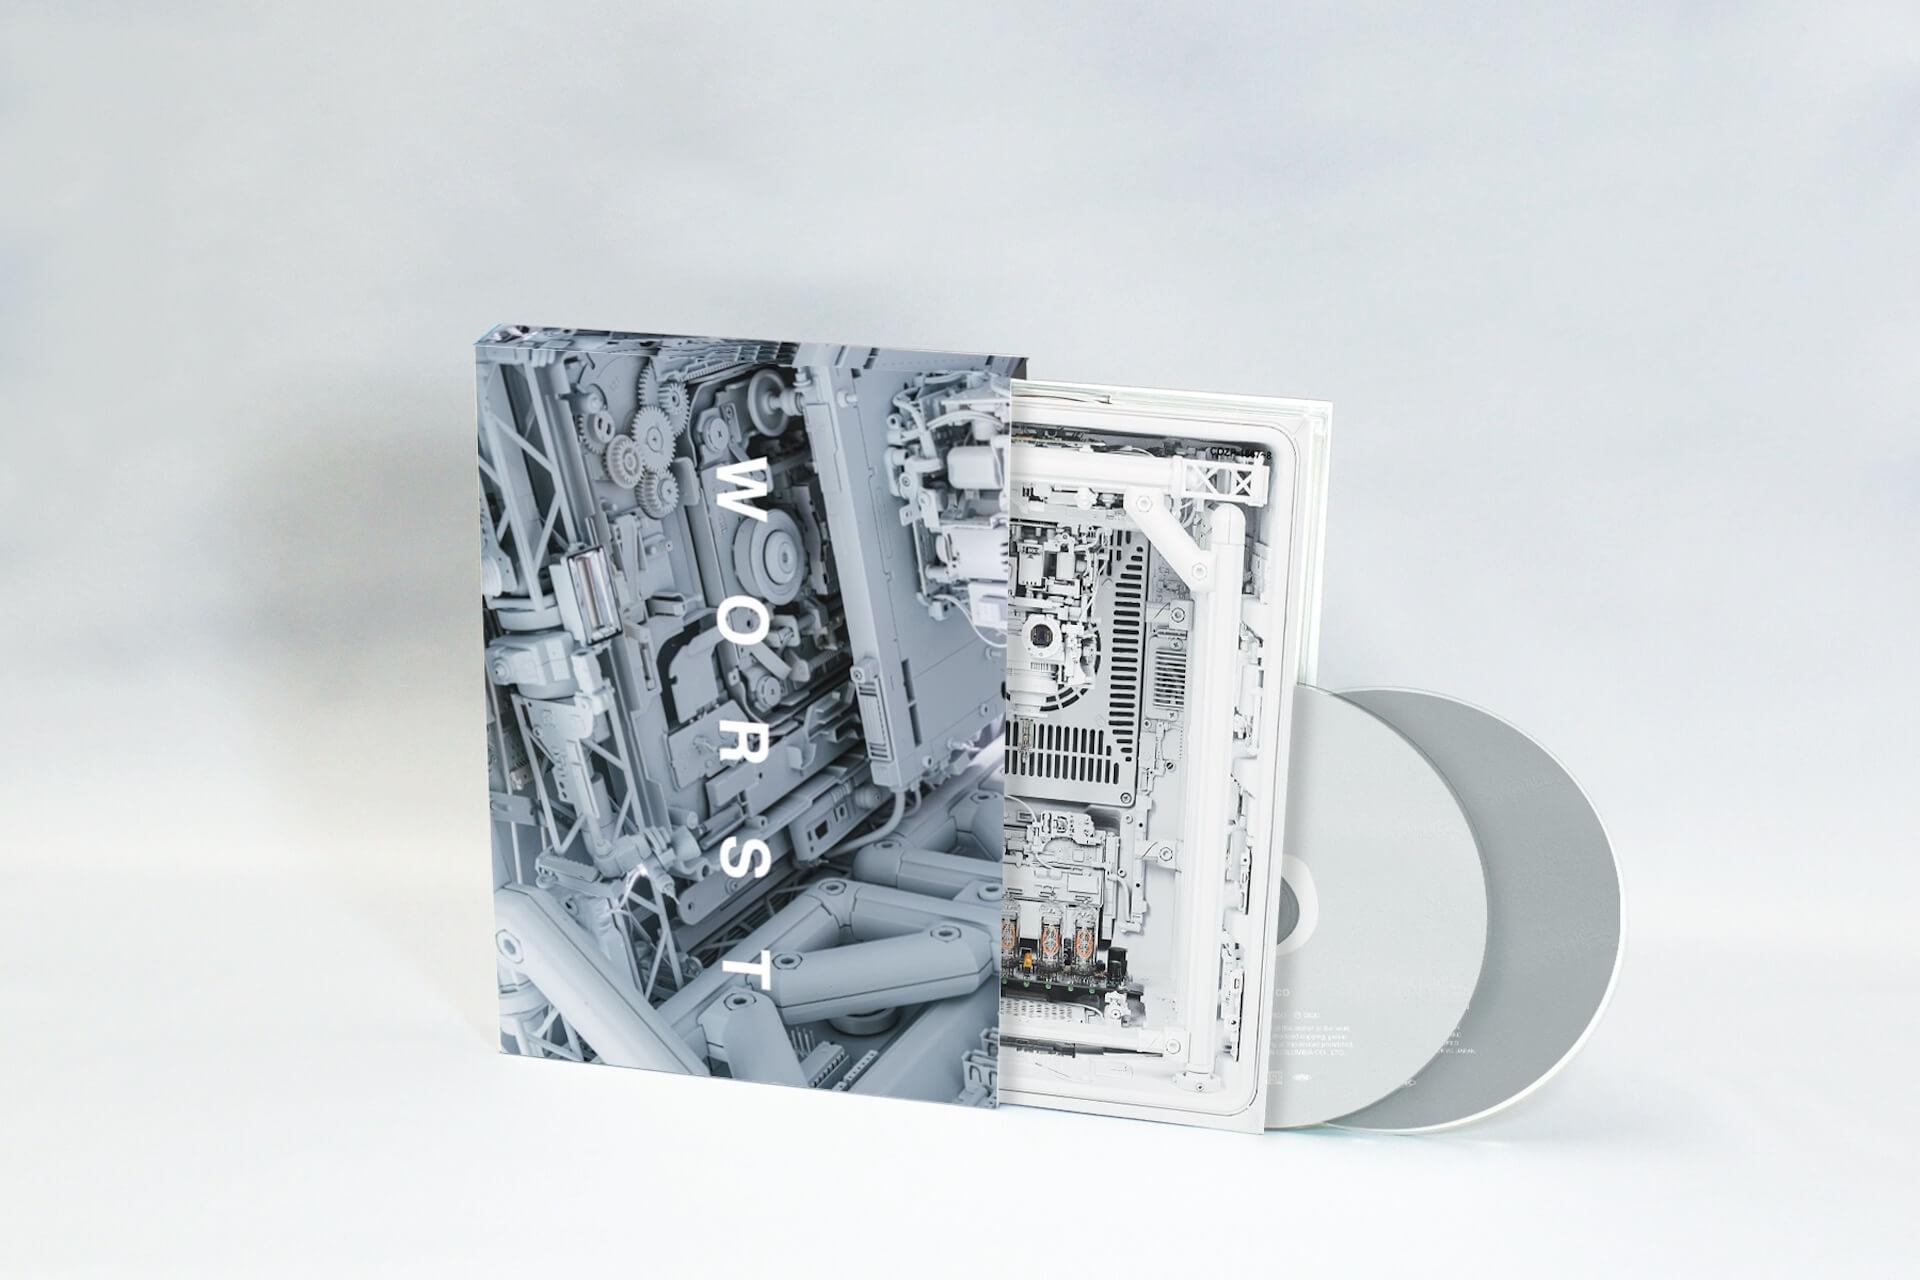 "KOHH、HAVIT ART STUDIO企画制作のディレクターズカット版MV""ひとつ""を限定公開!最新アルバムコンプリートボックスの予約受付も再開 music200420_kohh_worst_04"